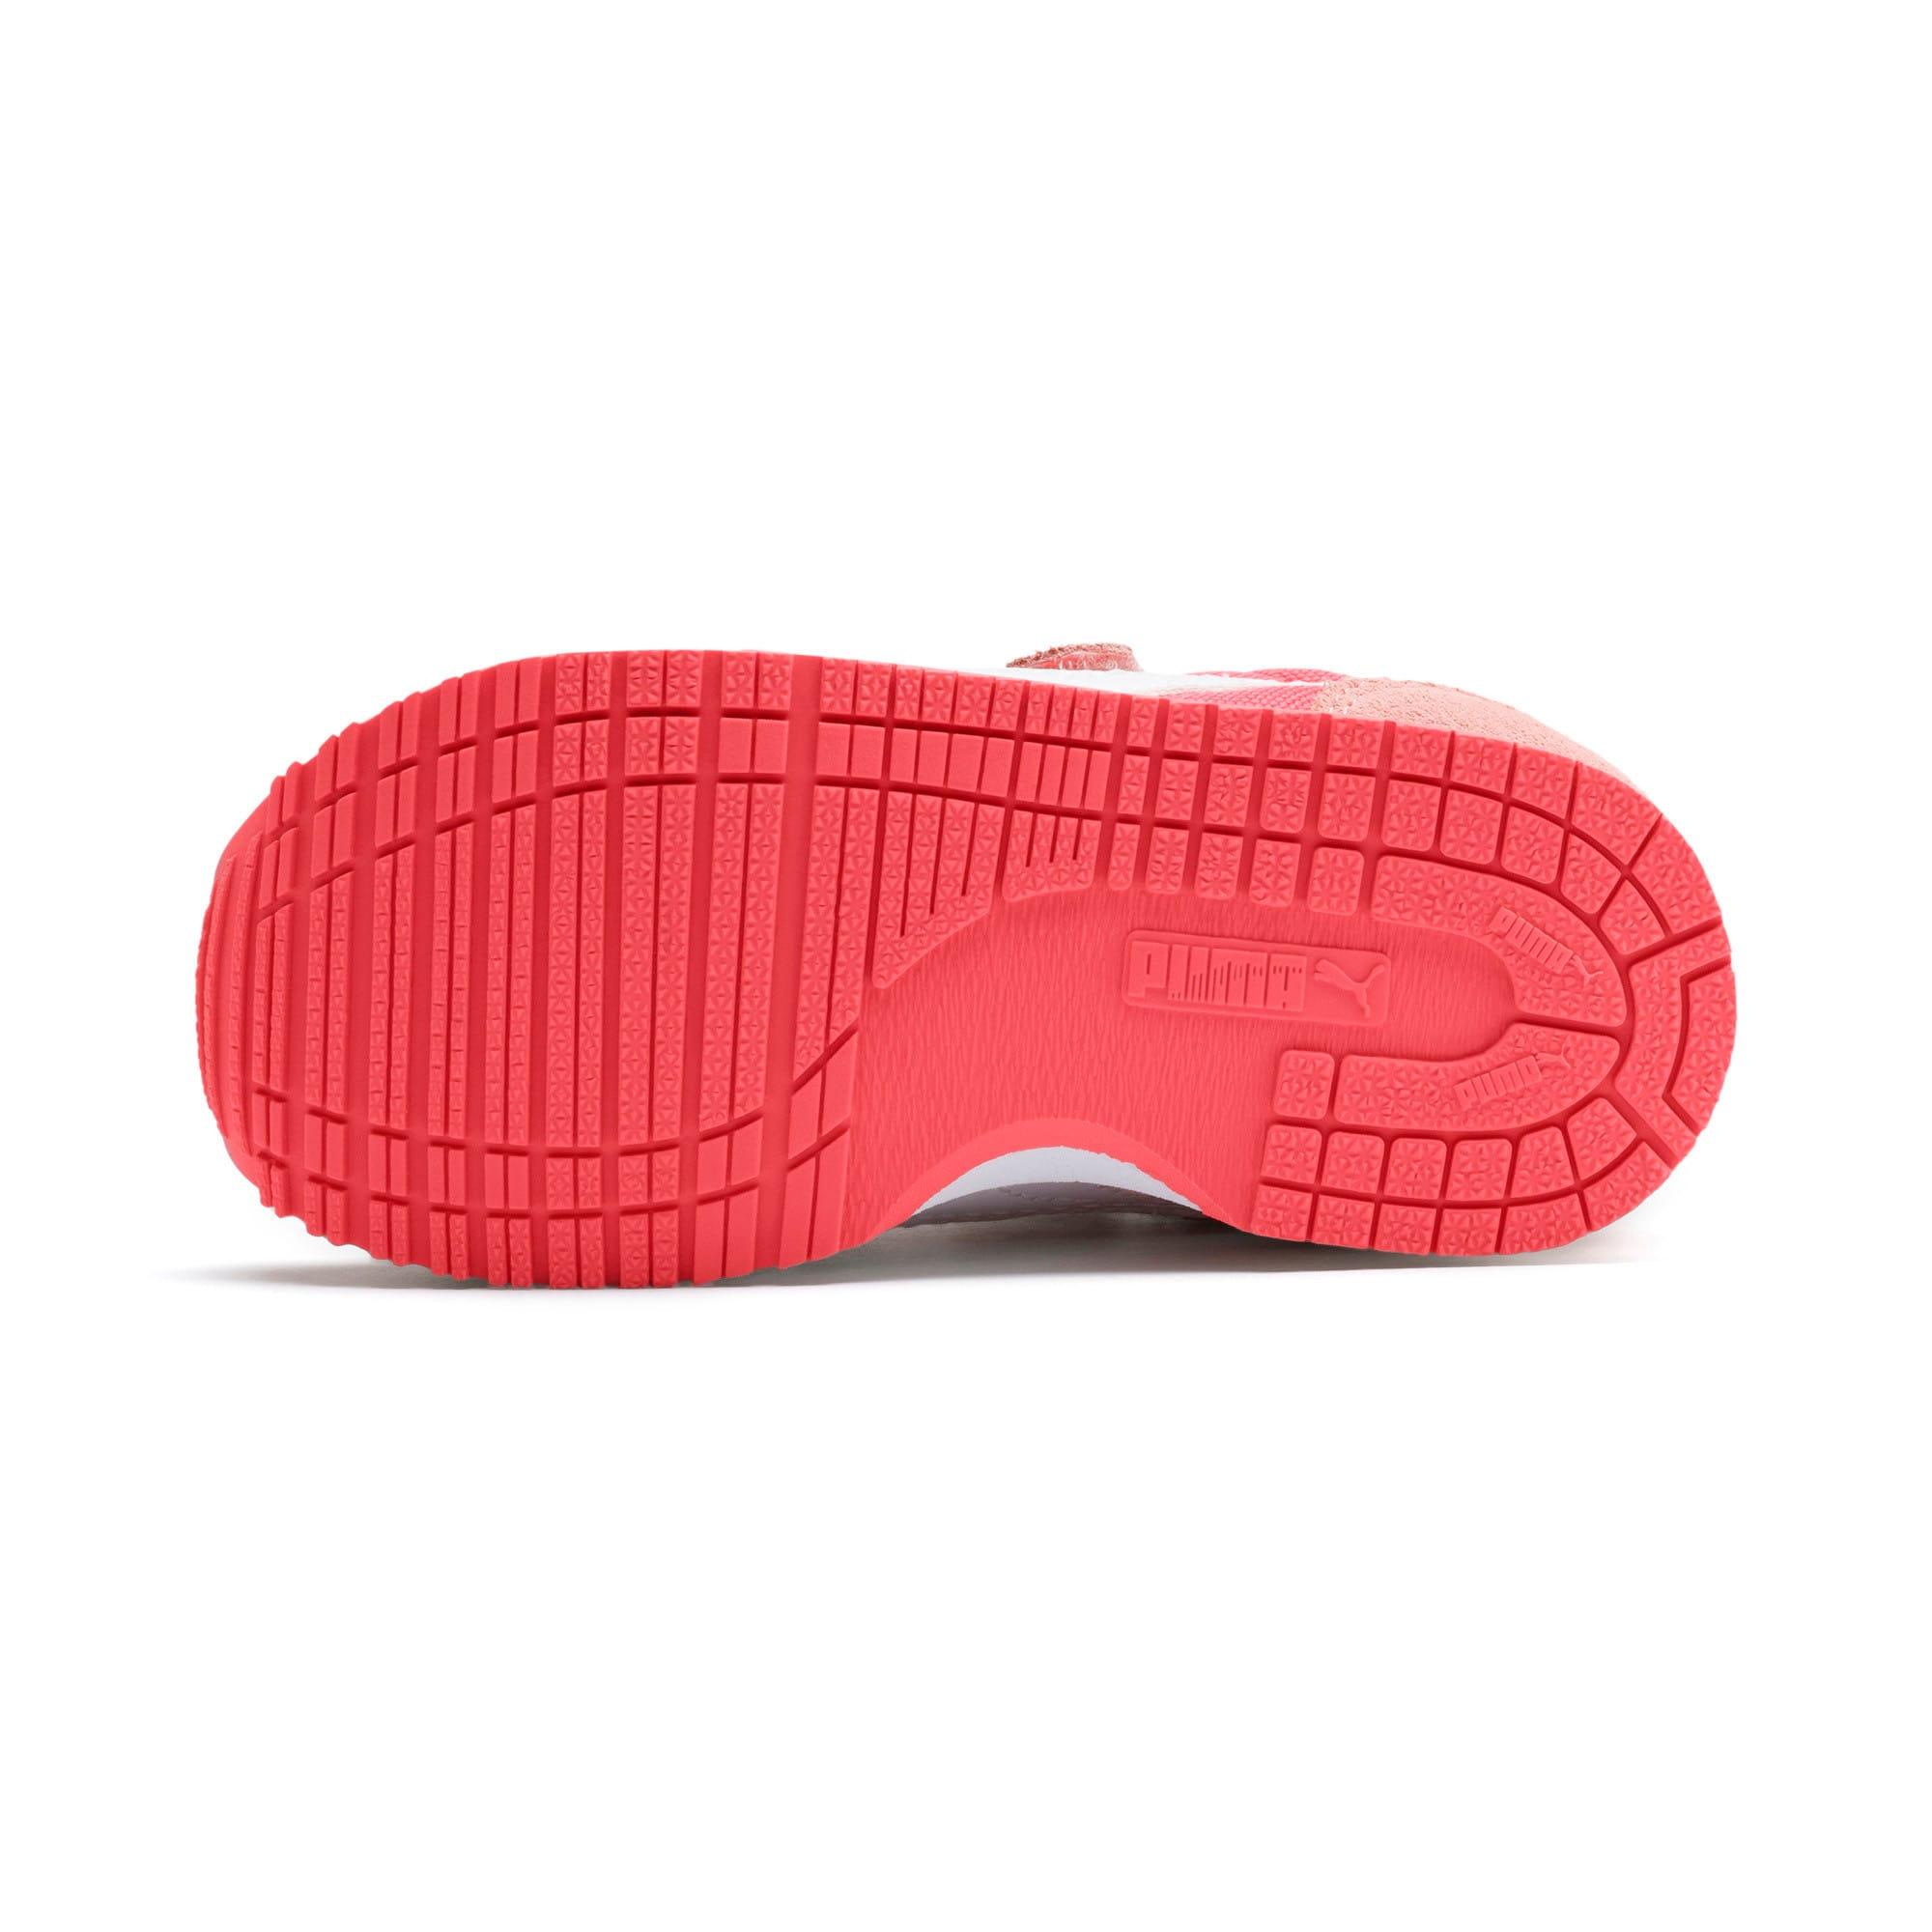 Thumbnail 4 of Cabana Racer Toddler Shoes, Calypso Coral-Bridal Rose, medium